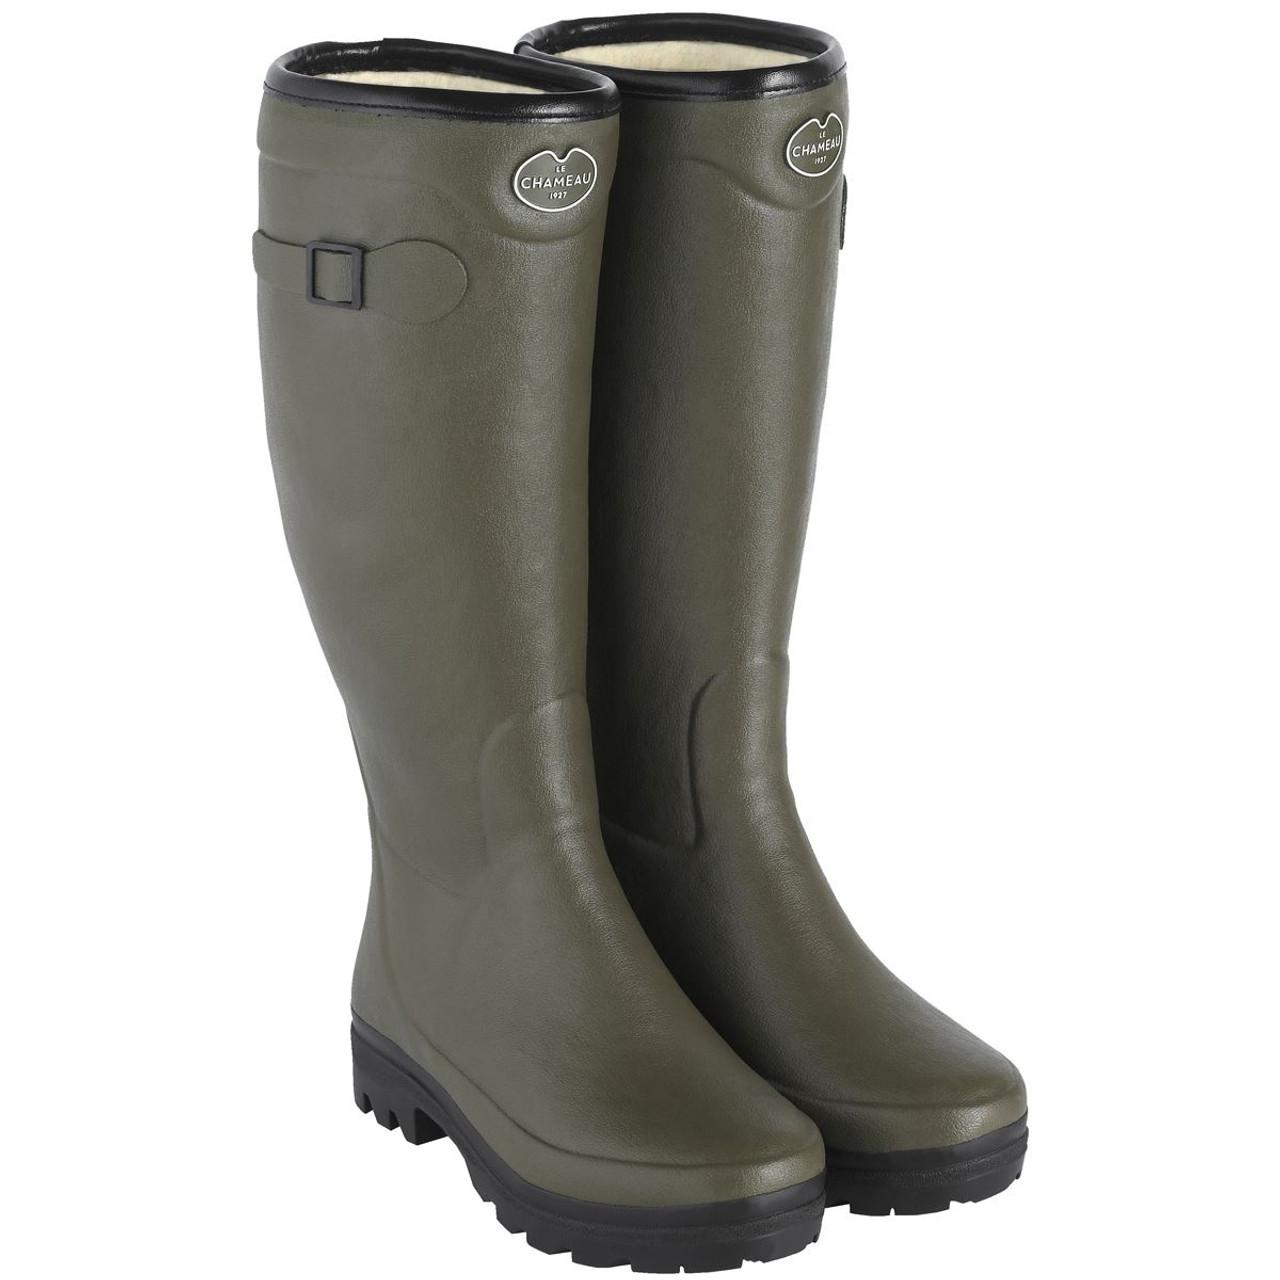 Le Chameau Country Lady Fouree Wellington Boots